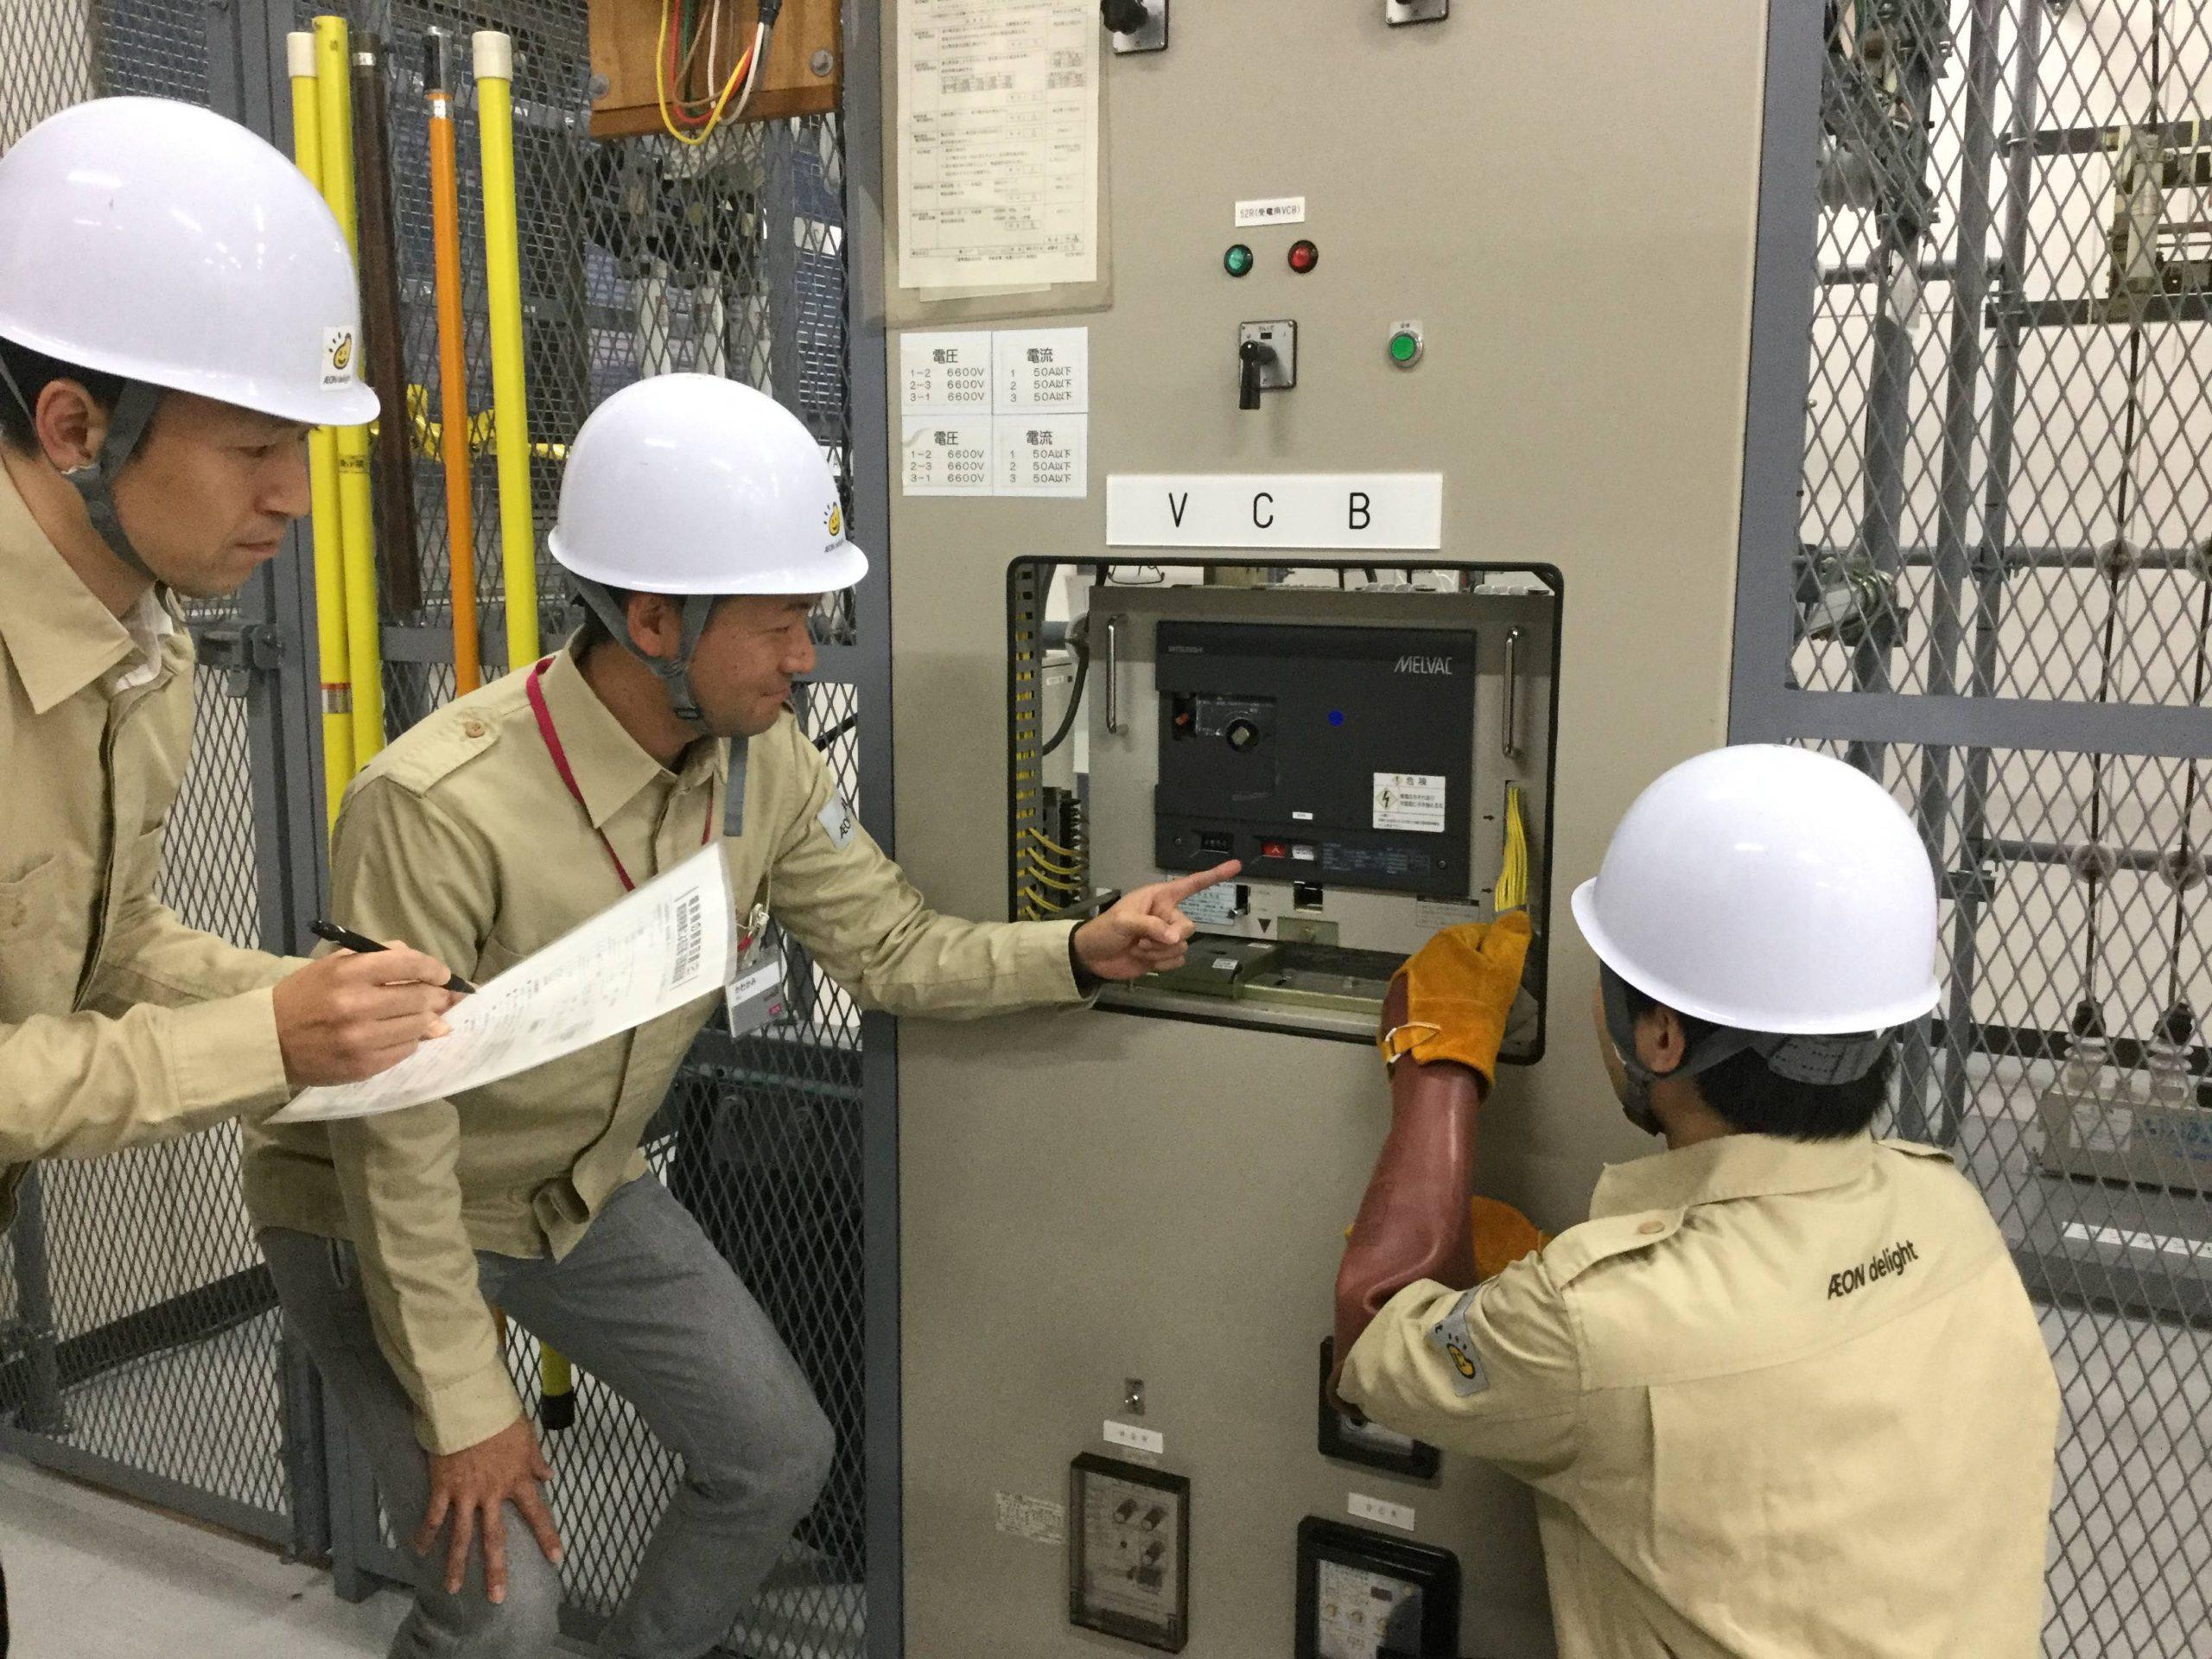 商業施設の設備管理